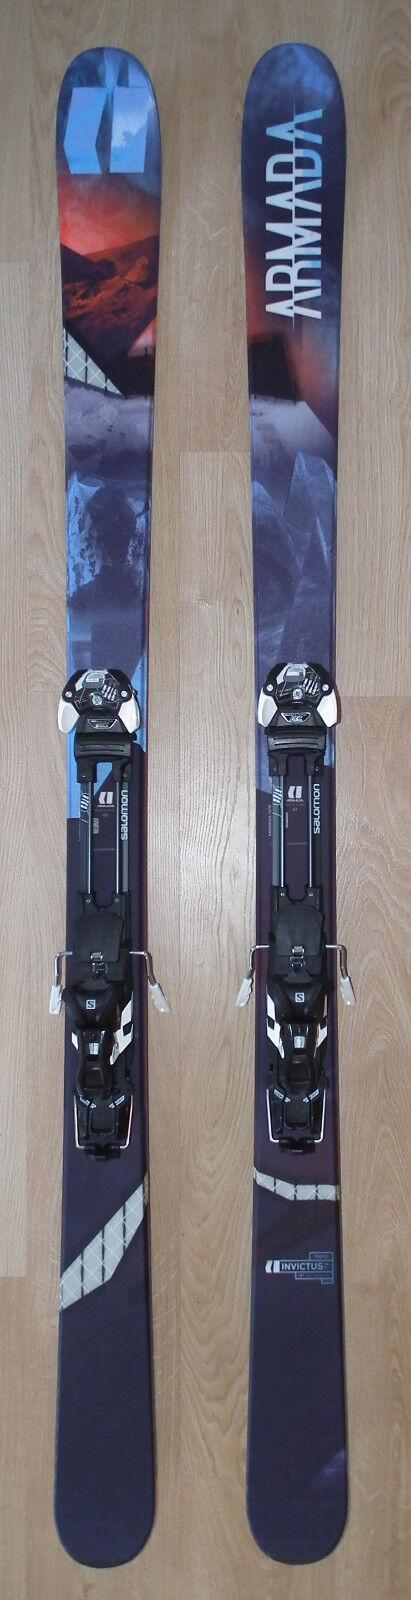 Armada Invictus 99 Ti Skis 187cm & Salomon Guardian MNC 13 L Bindings (2018)